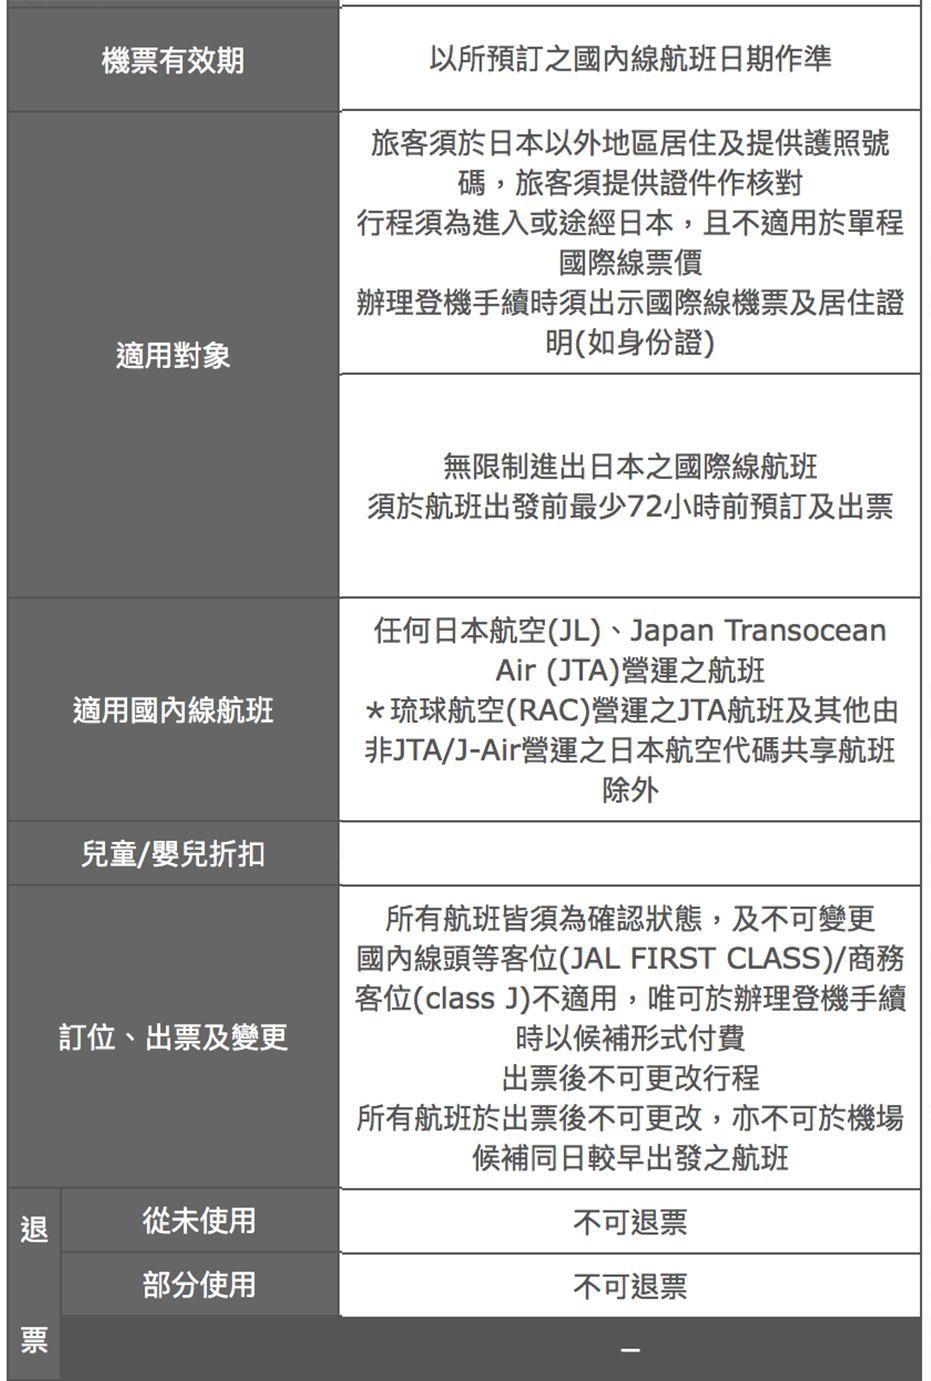 JAL推出外國人乘搭內陸機優惠 全日本飛東北 單程港幣360